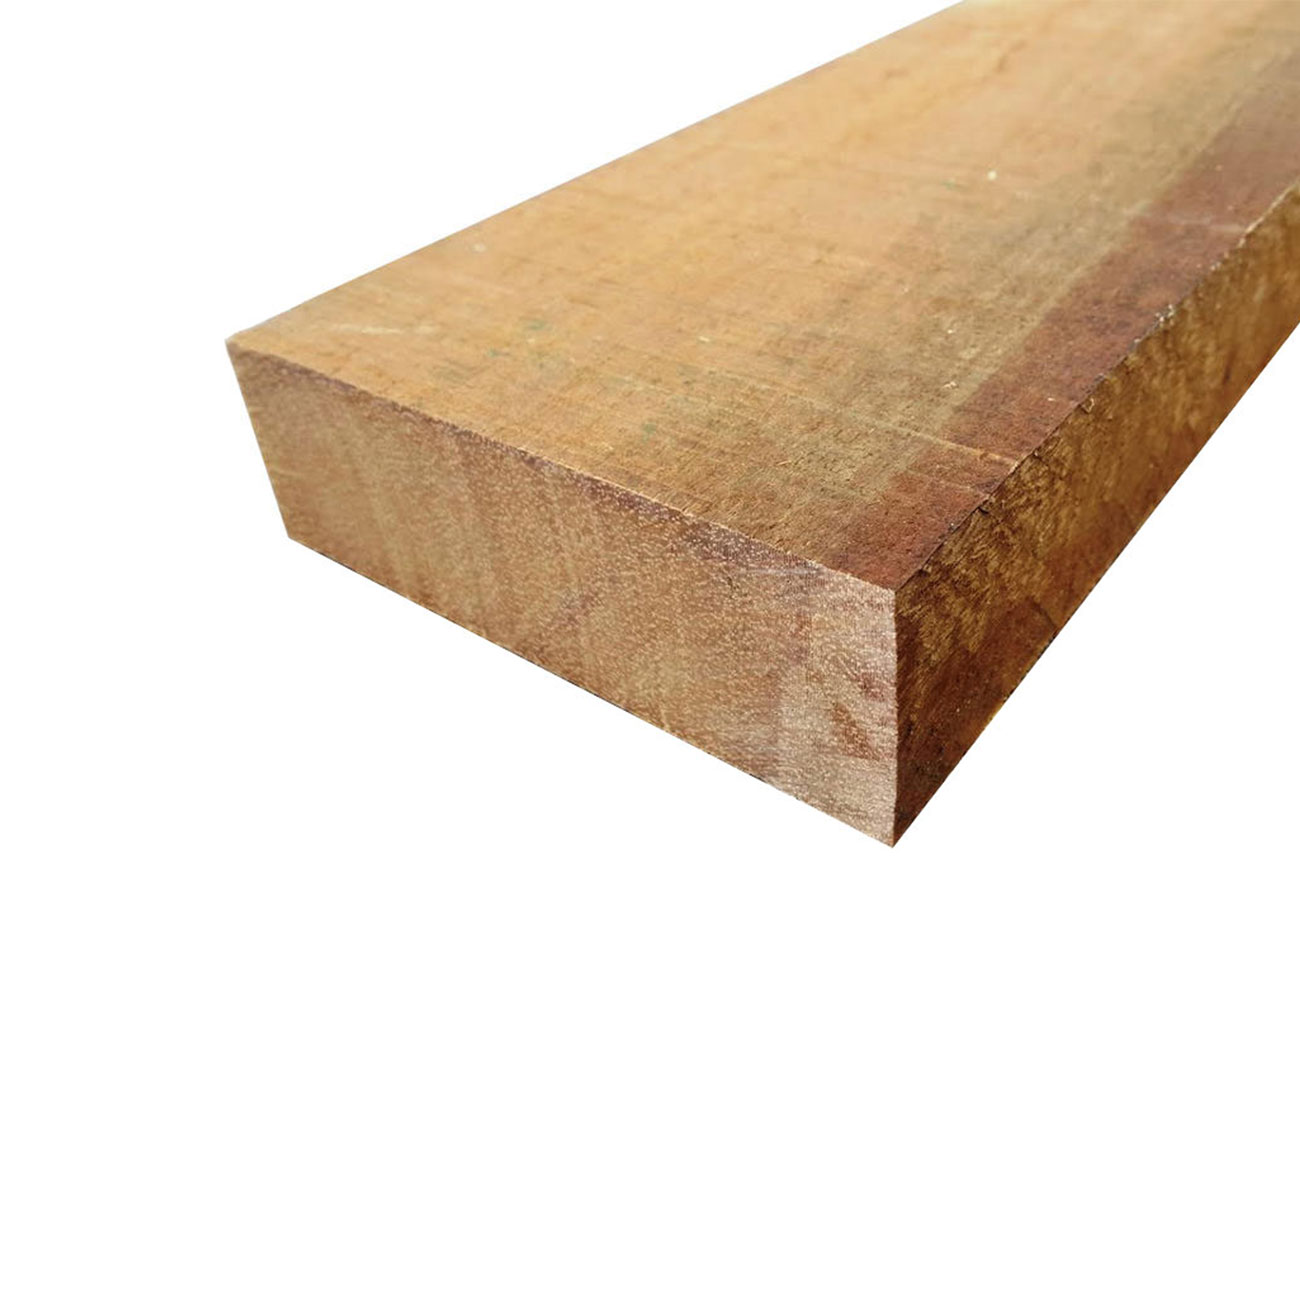 Soort hardhout: azobe afmeting: 4 x 20 cm lengte: 300 cm